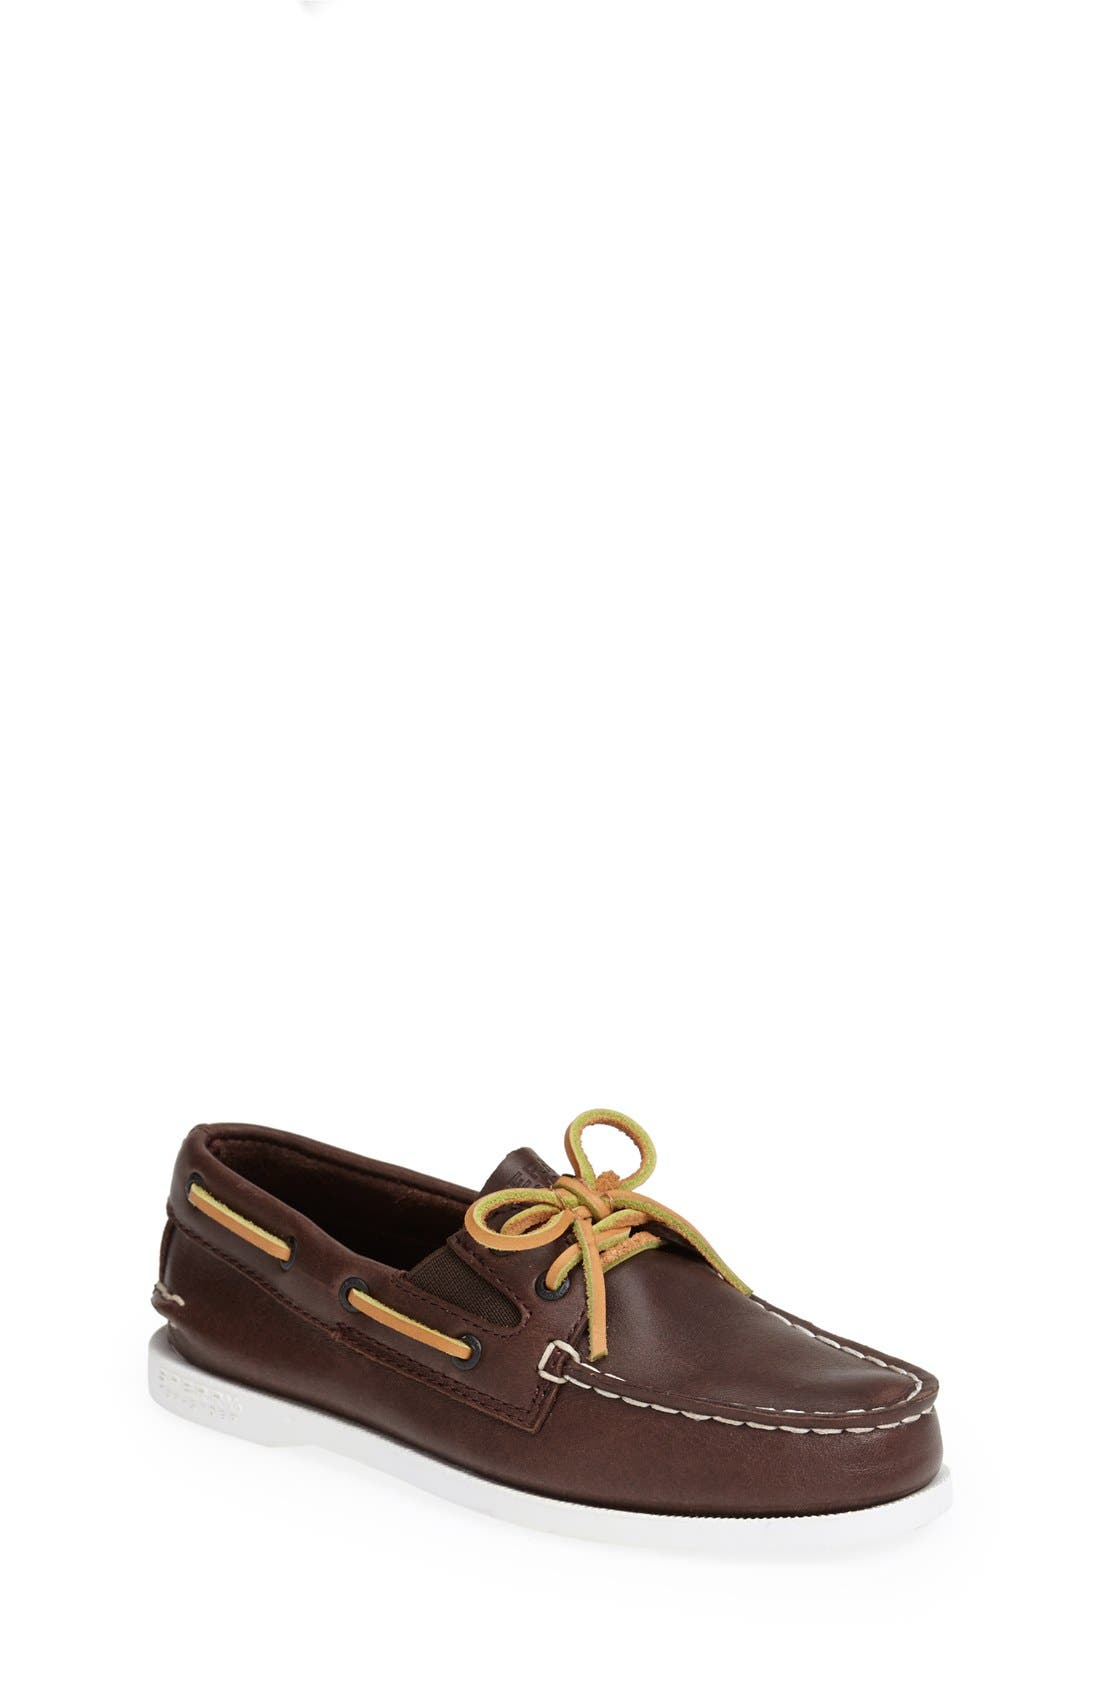 Main Image - Sperry Kids 'Authentic Original' Boat Shoe (Walker, Toddler, Little Kid & Big Kid)